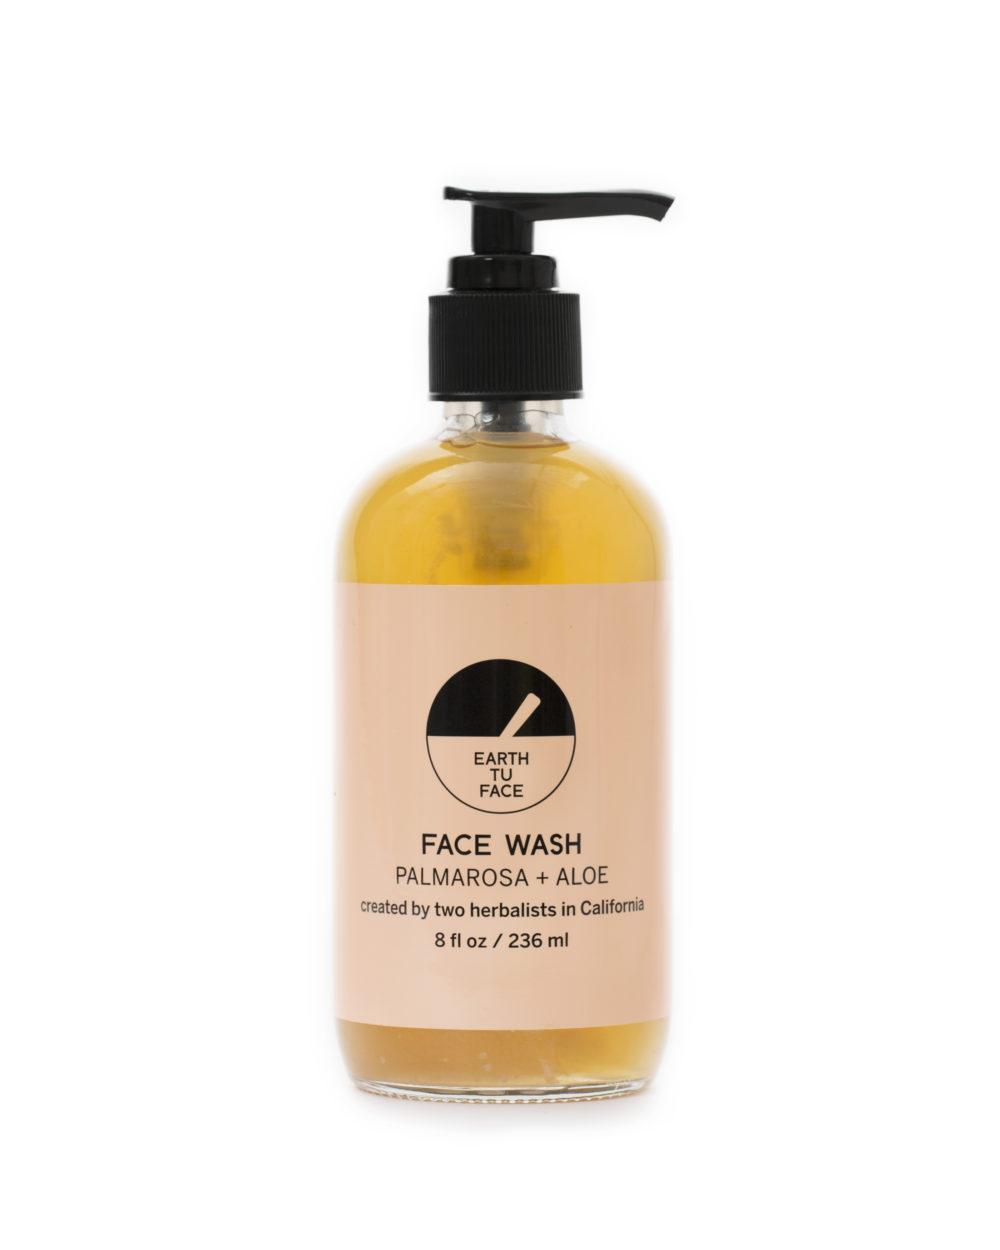 Palmarosa + Aloe Face Wash